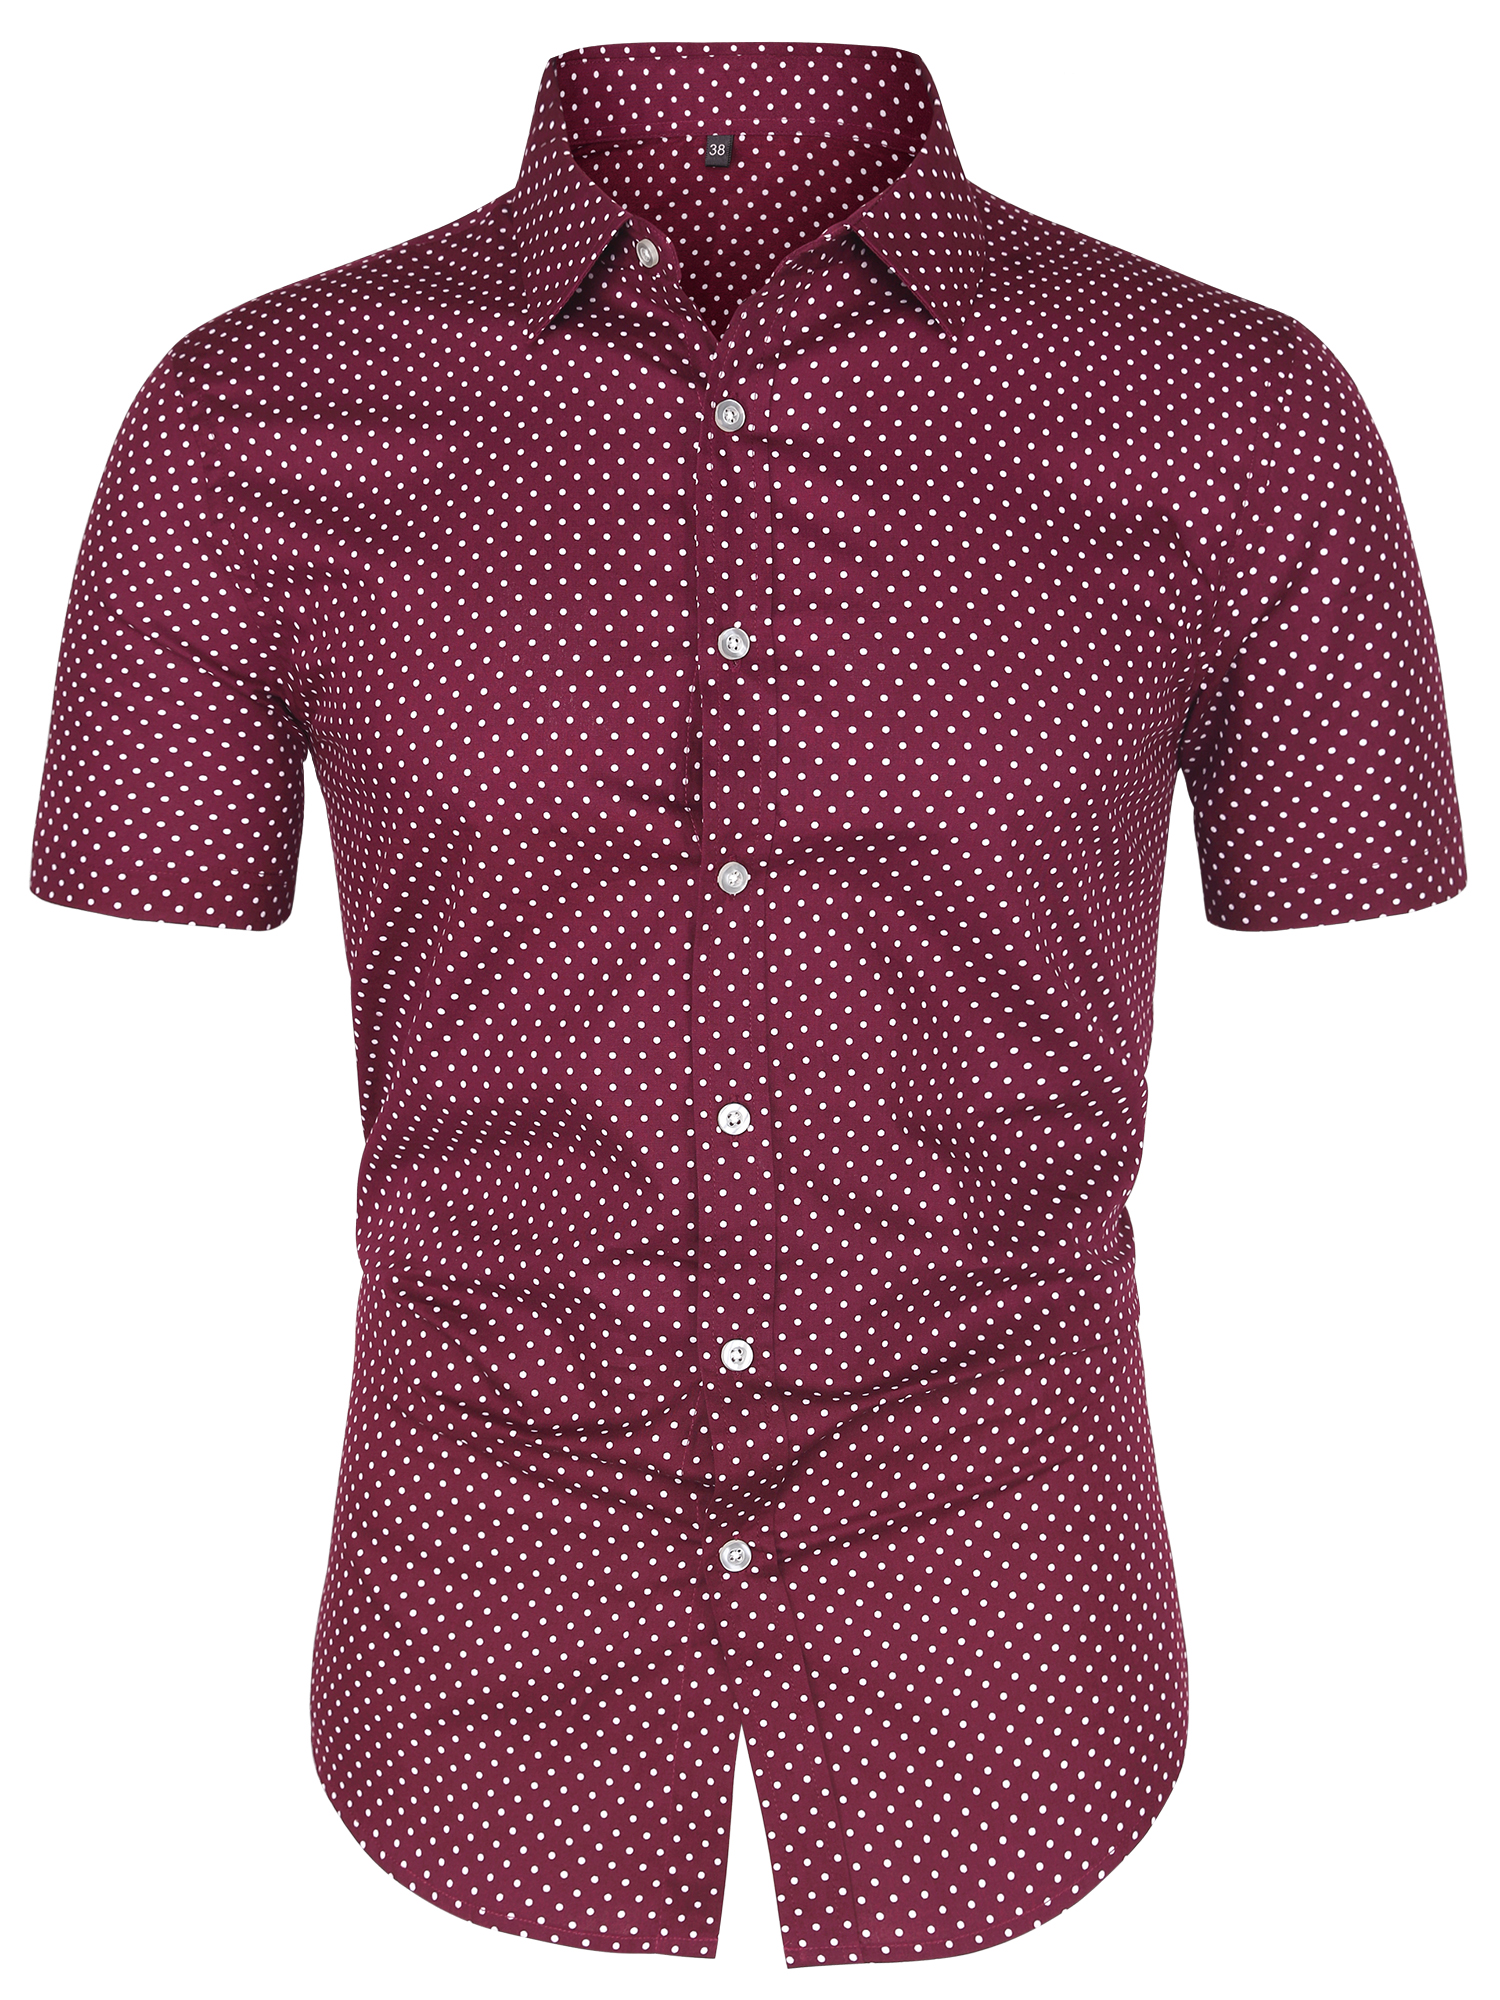 Men Short Sleeves Cotton Polka Dots Button Up Shirt Burgundy S (US 34)